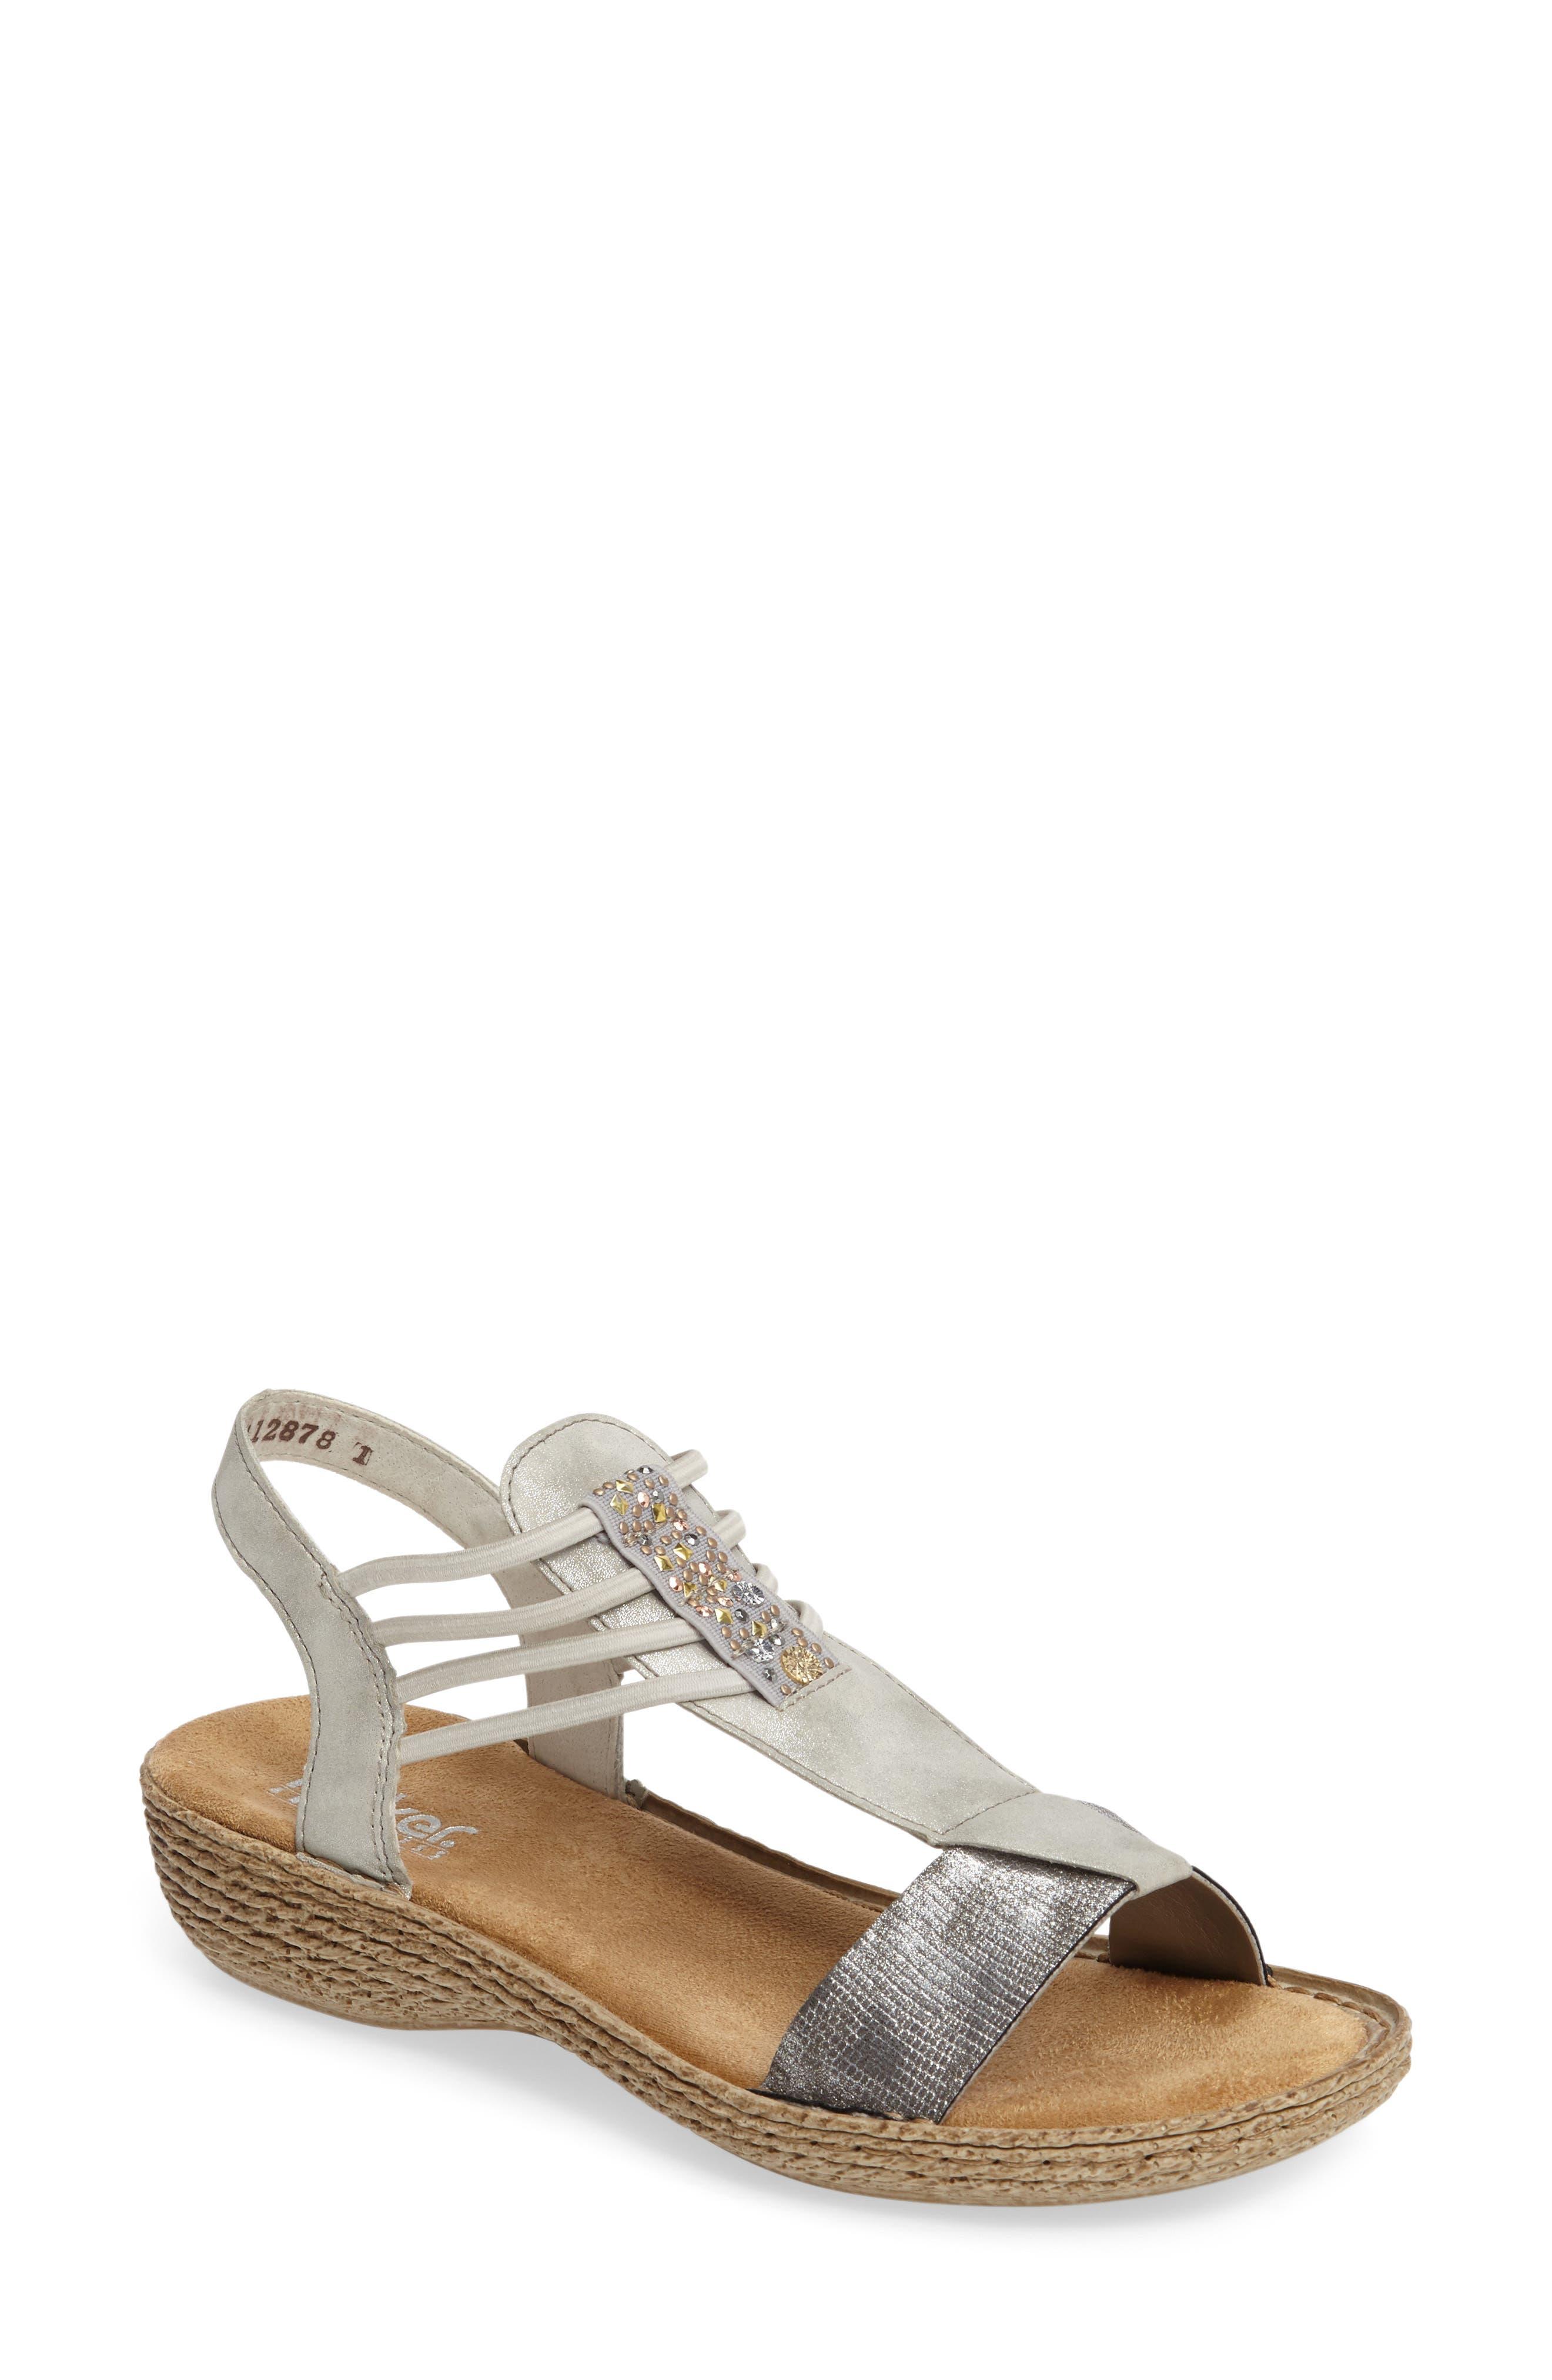 Regina T-Strap Sandal,                         Main,                         color, 061